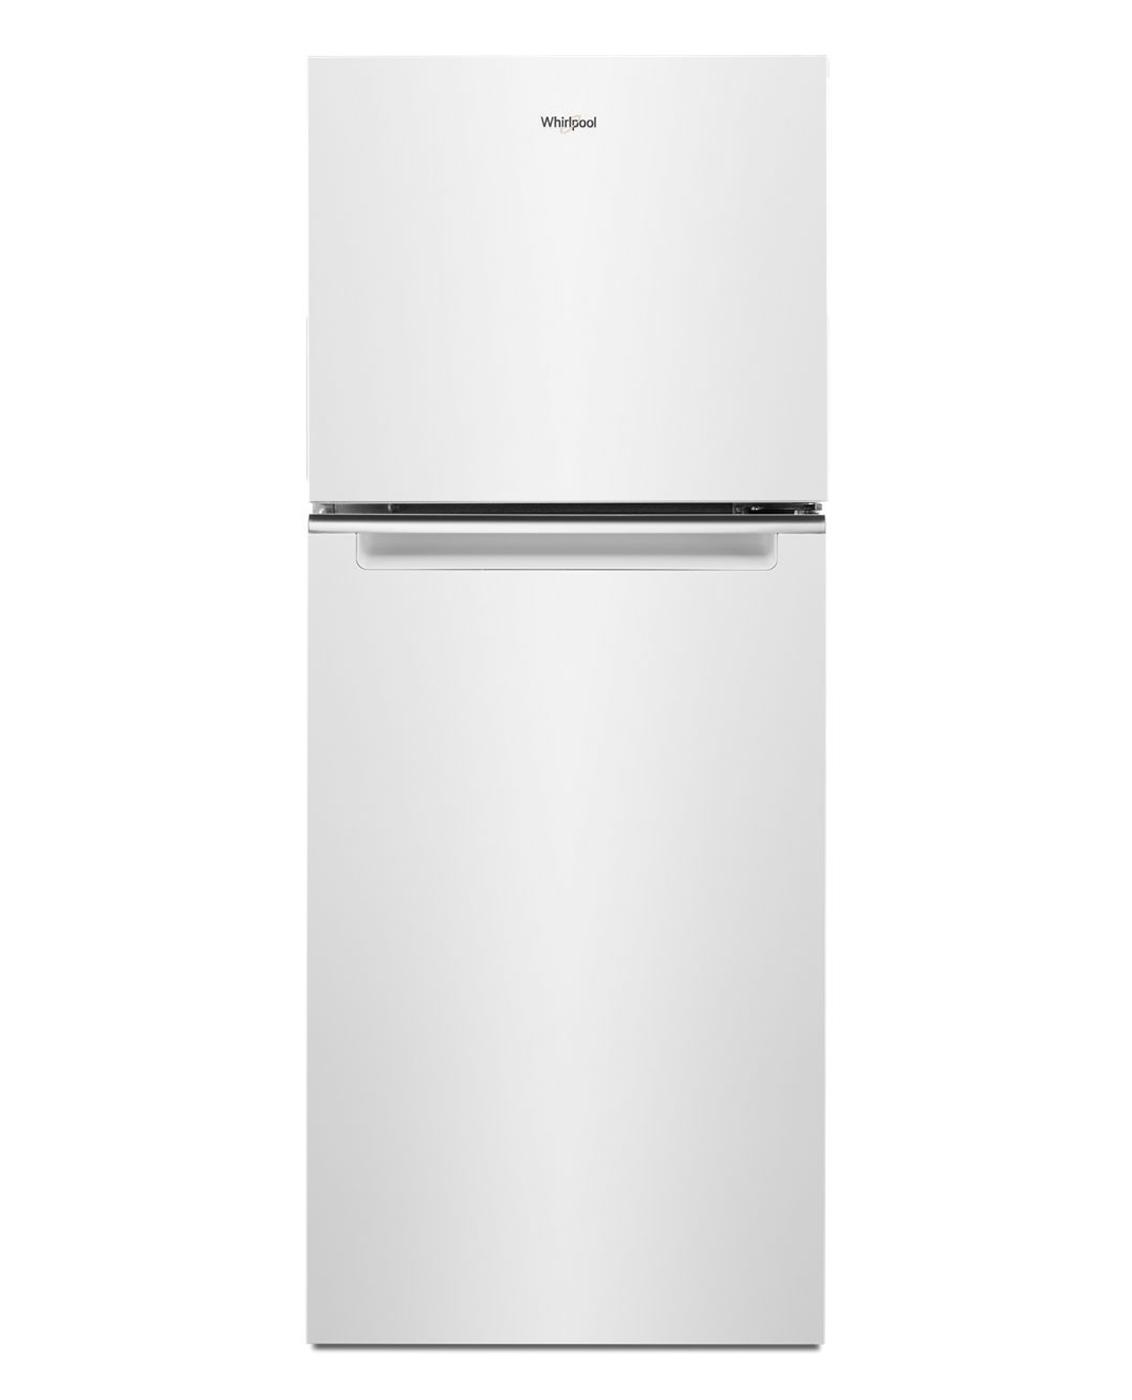 Whirlpool 11.6 Cu. Ft. White Top-Freezer Refrigerator